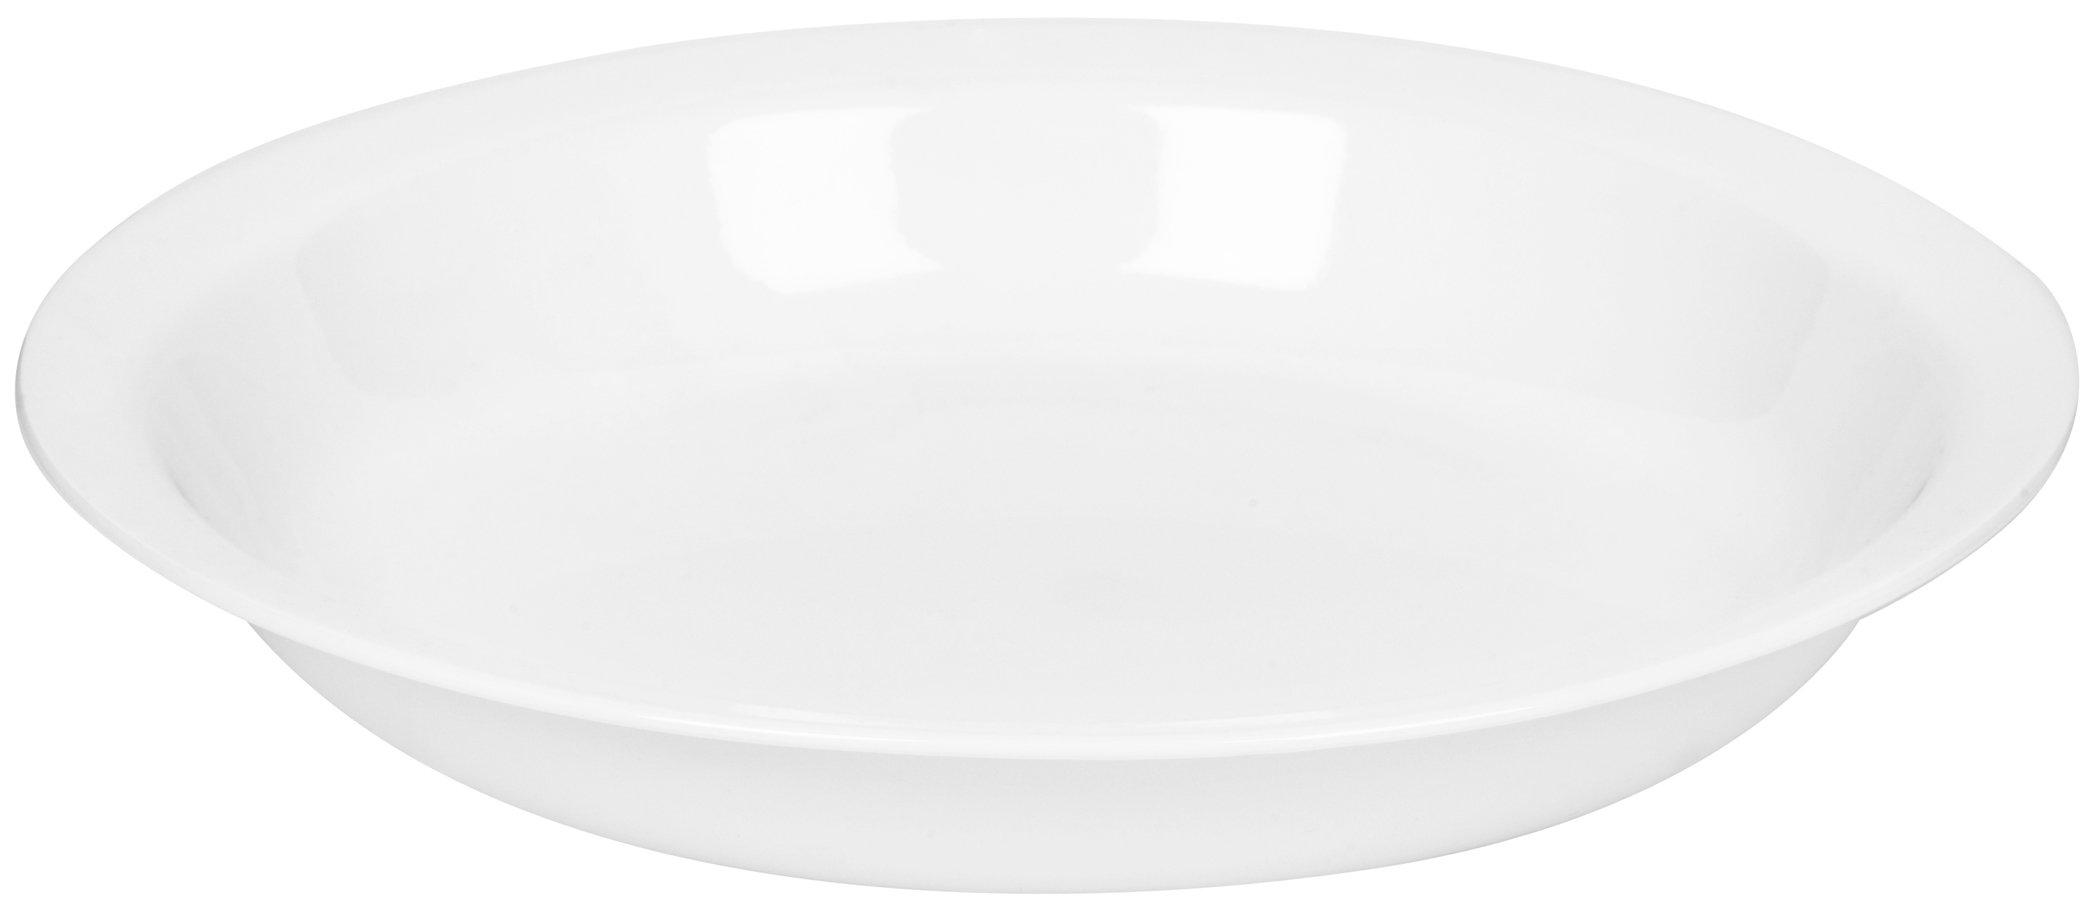 Corelle Livingware 9-Inch Deep Dish Pie Plate, Winter Frost White